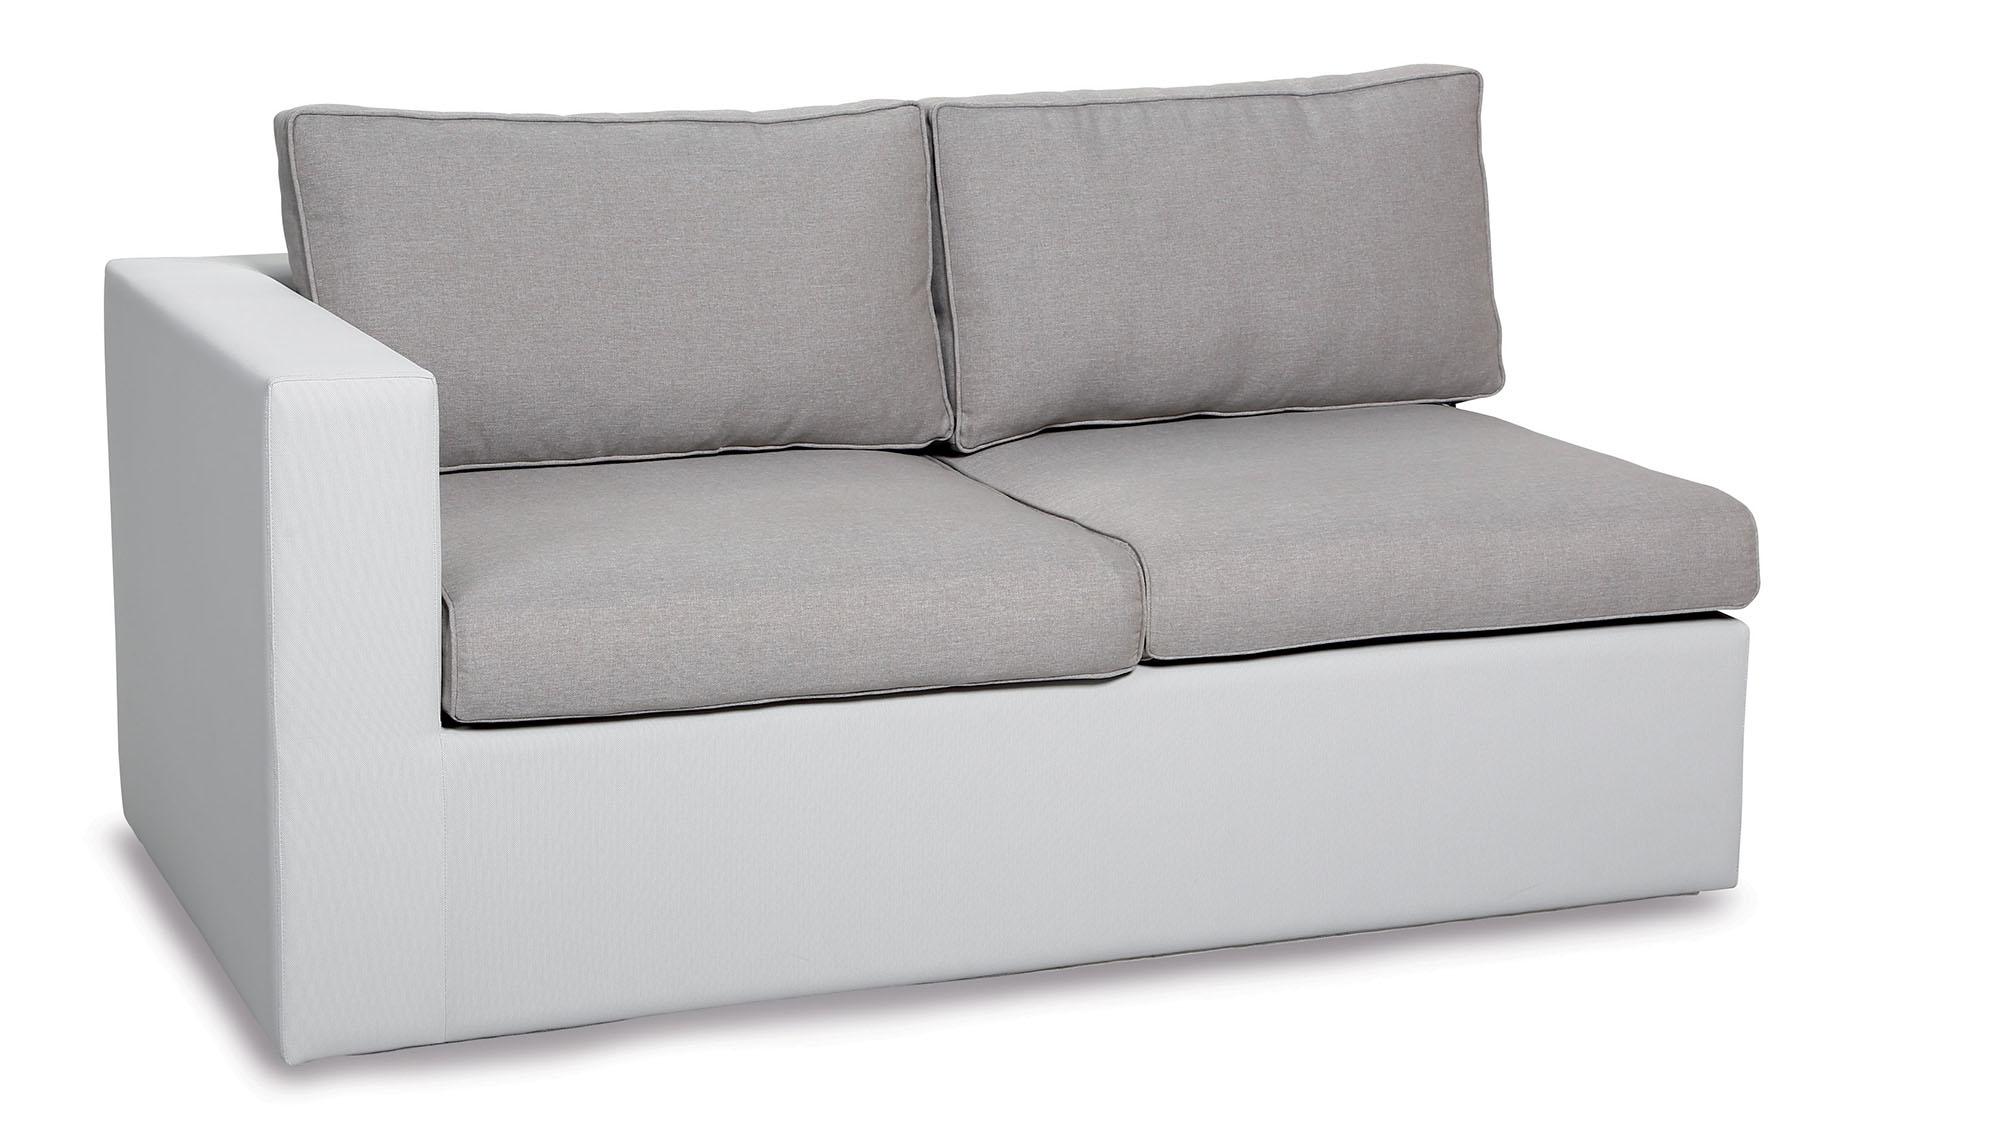 sao paulo sofa accoudoir droit kf m bel. Black Bedroom Furniture Sets. Home Design Ideas